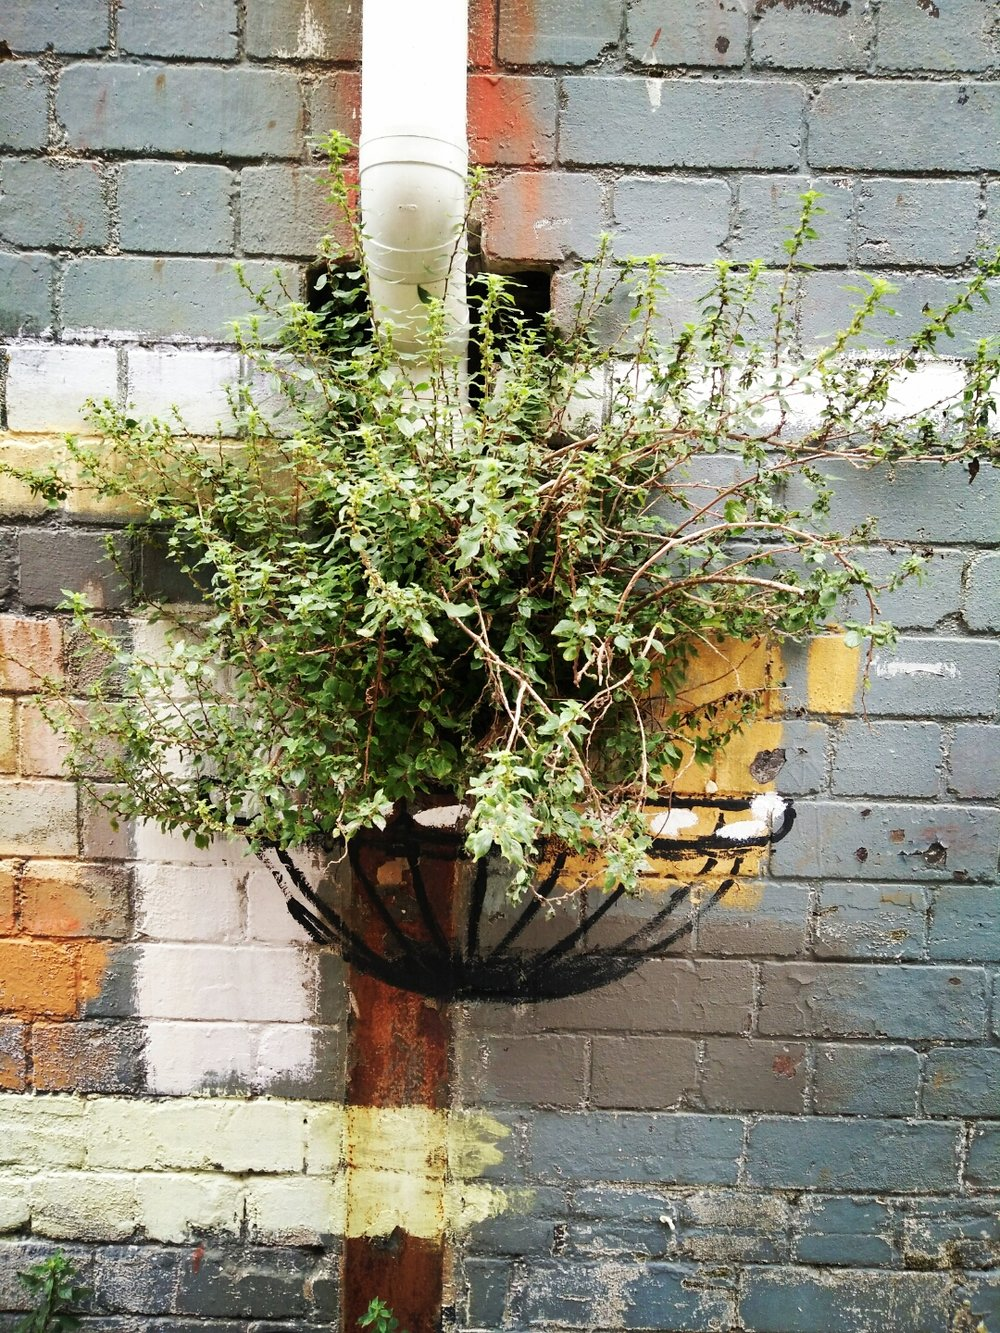 Weeds and graffiti